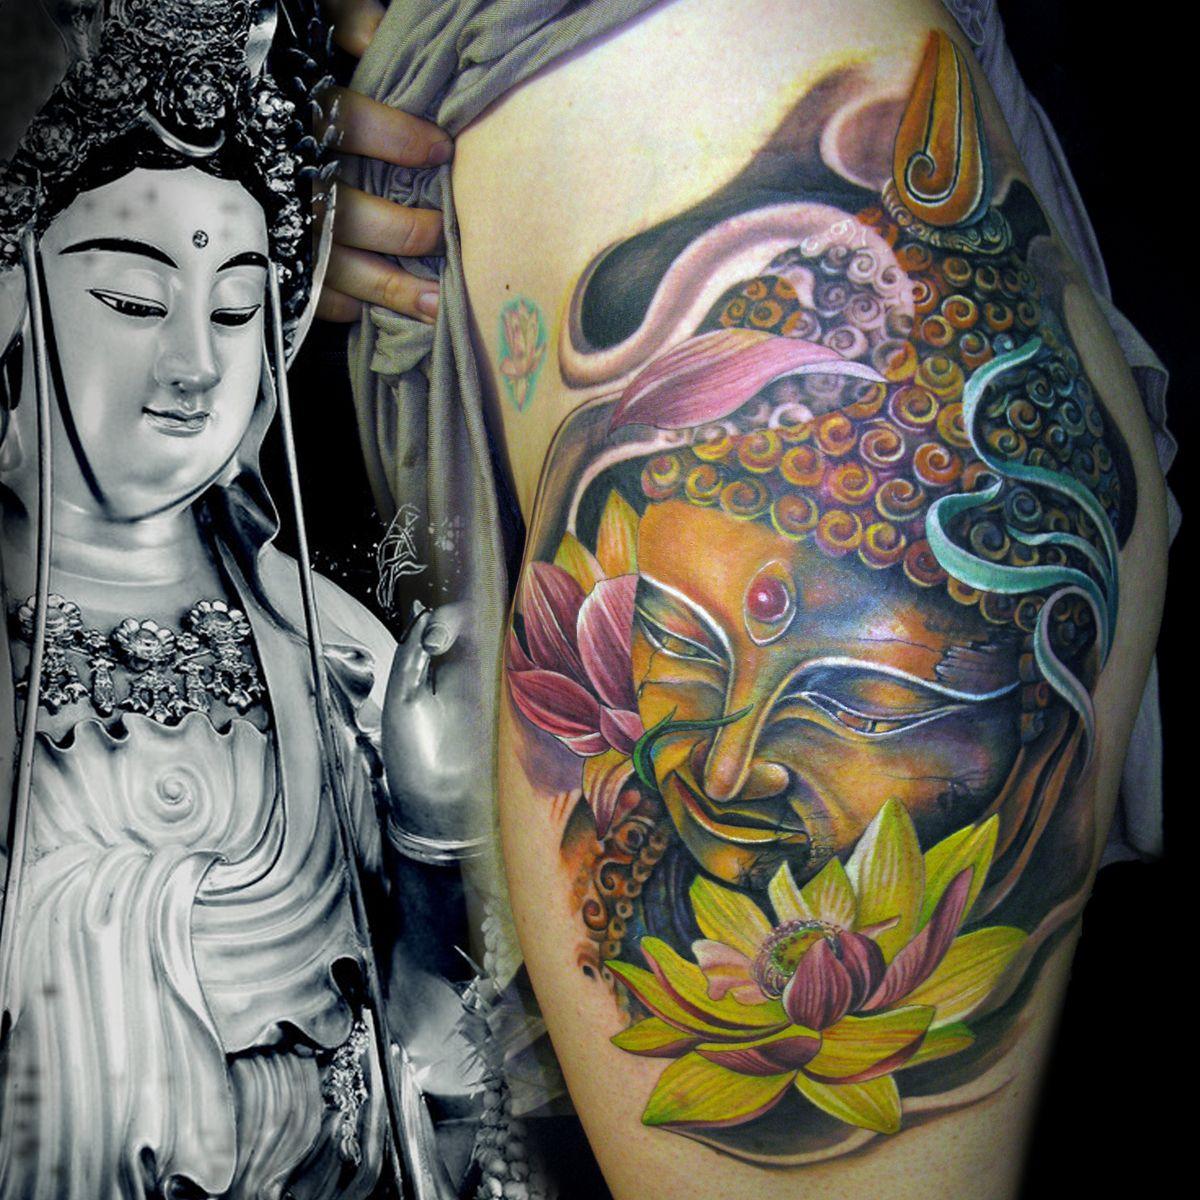 Tattoo Color Buddha Lotus Tattoos Pinterest Buddha Lotus